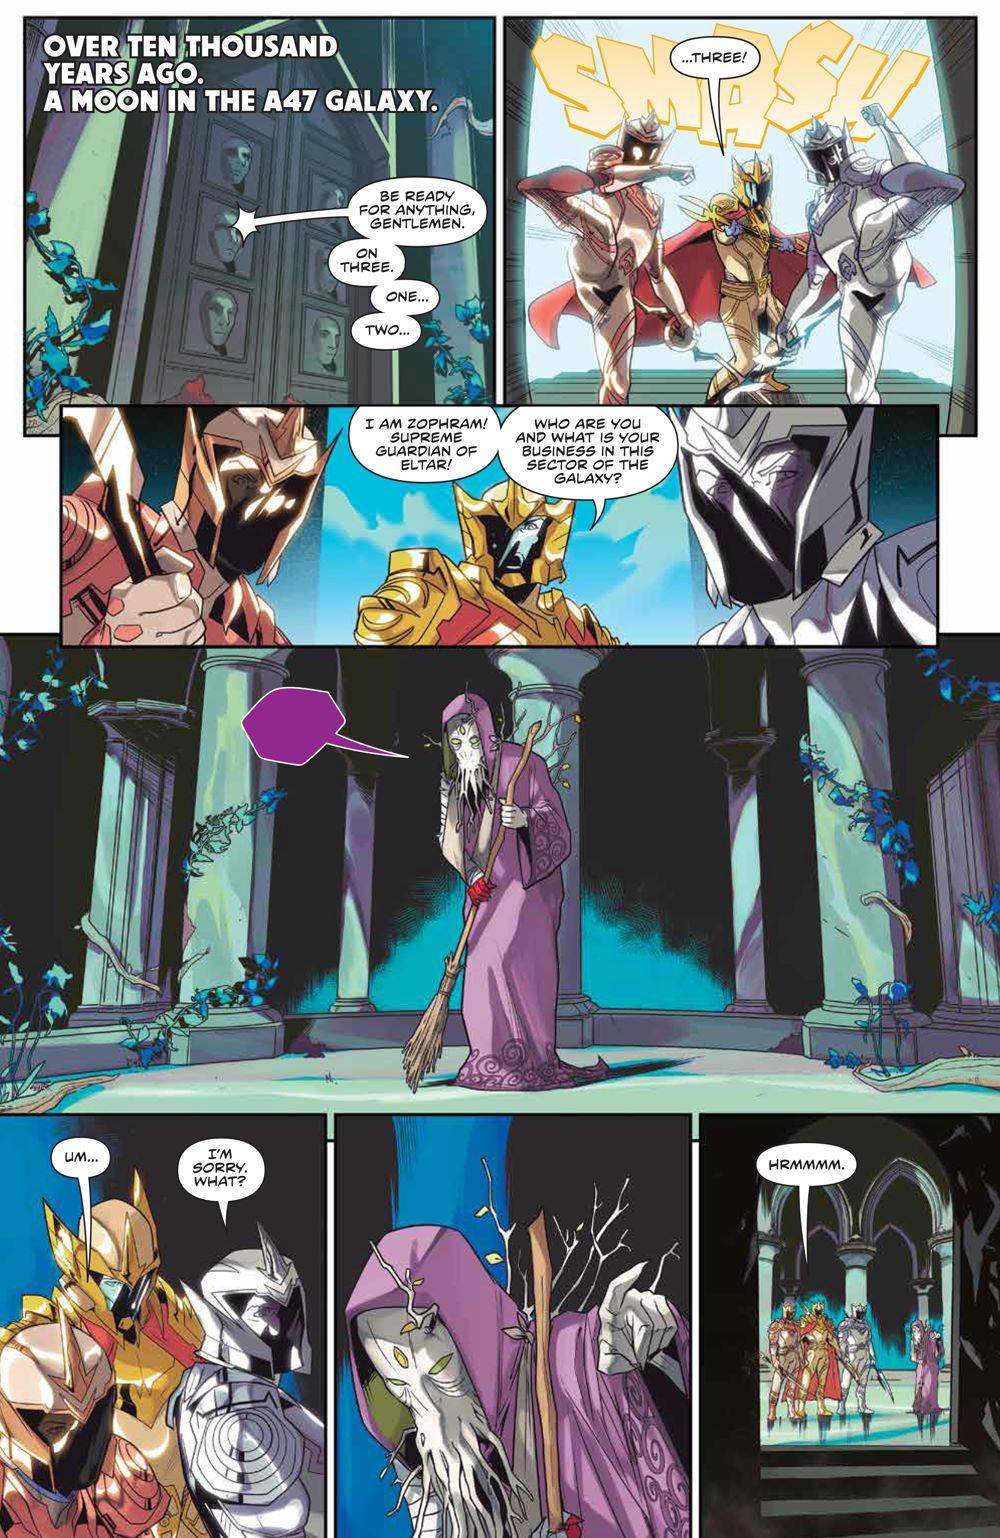 MightyMorphin_007_PRESS_3 ComicList Previews: MIGHTY MORPHIN #7